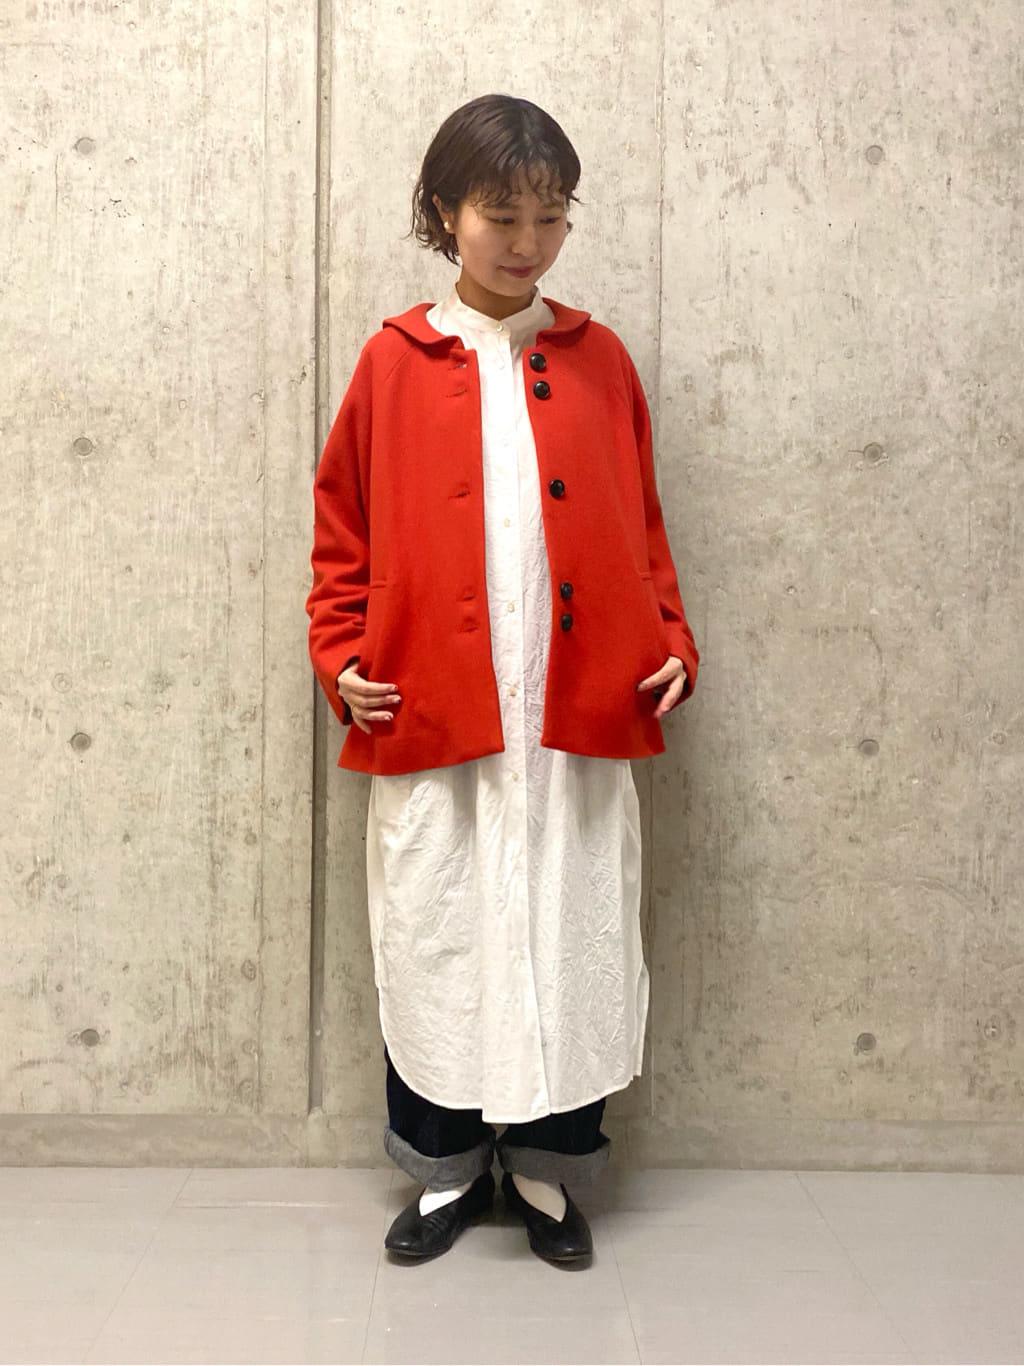 bulle de savon 阪急西宮ガーデンズ 身長:149cm 2021.09.22